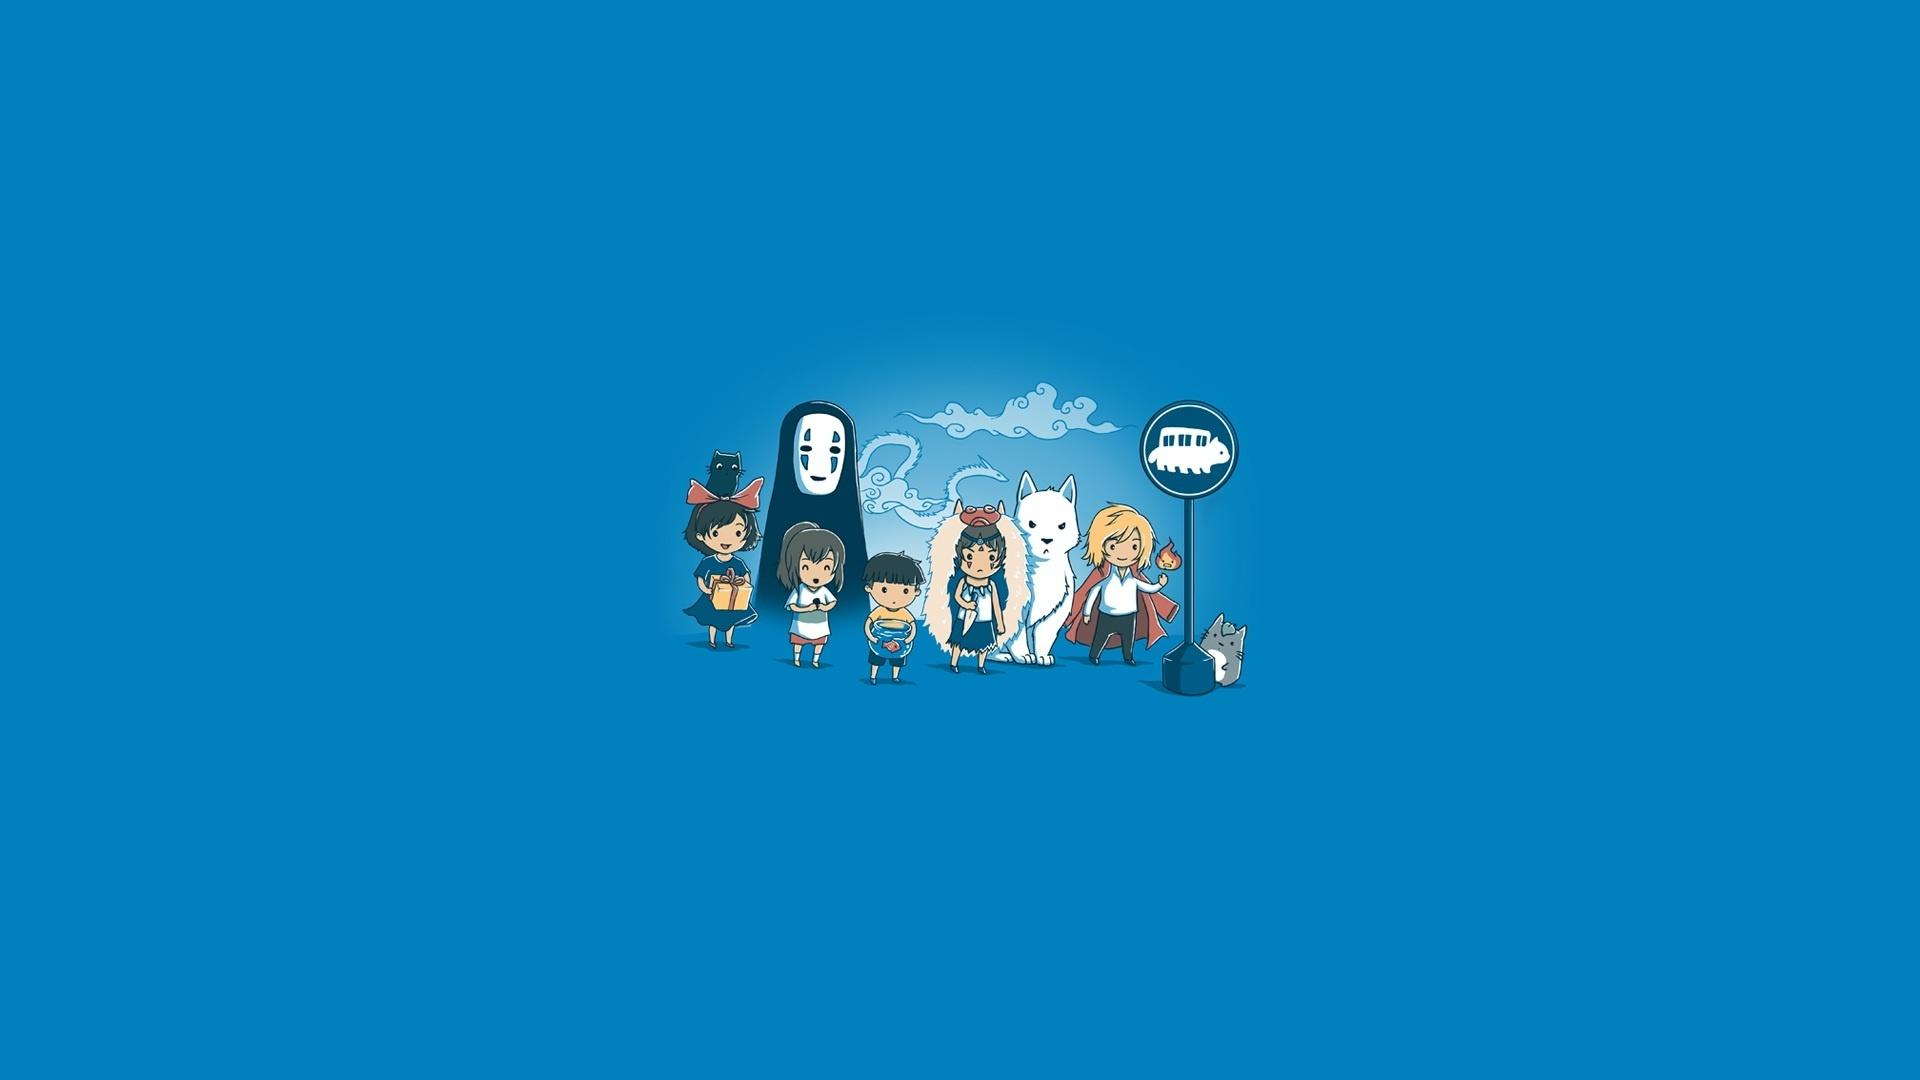 1920x1080 Hayao Miyazaki hình nền